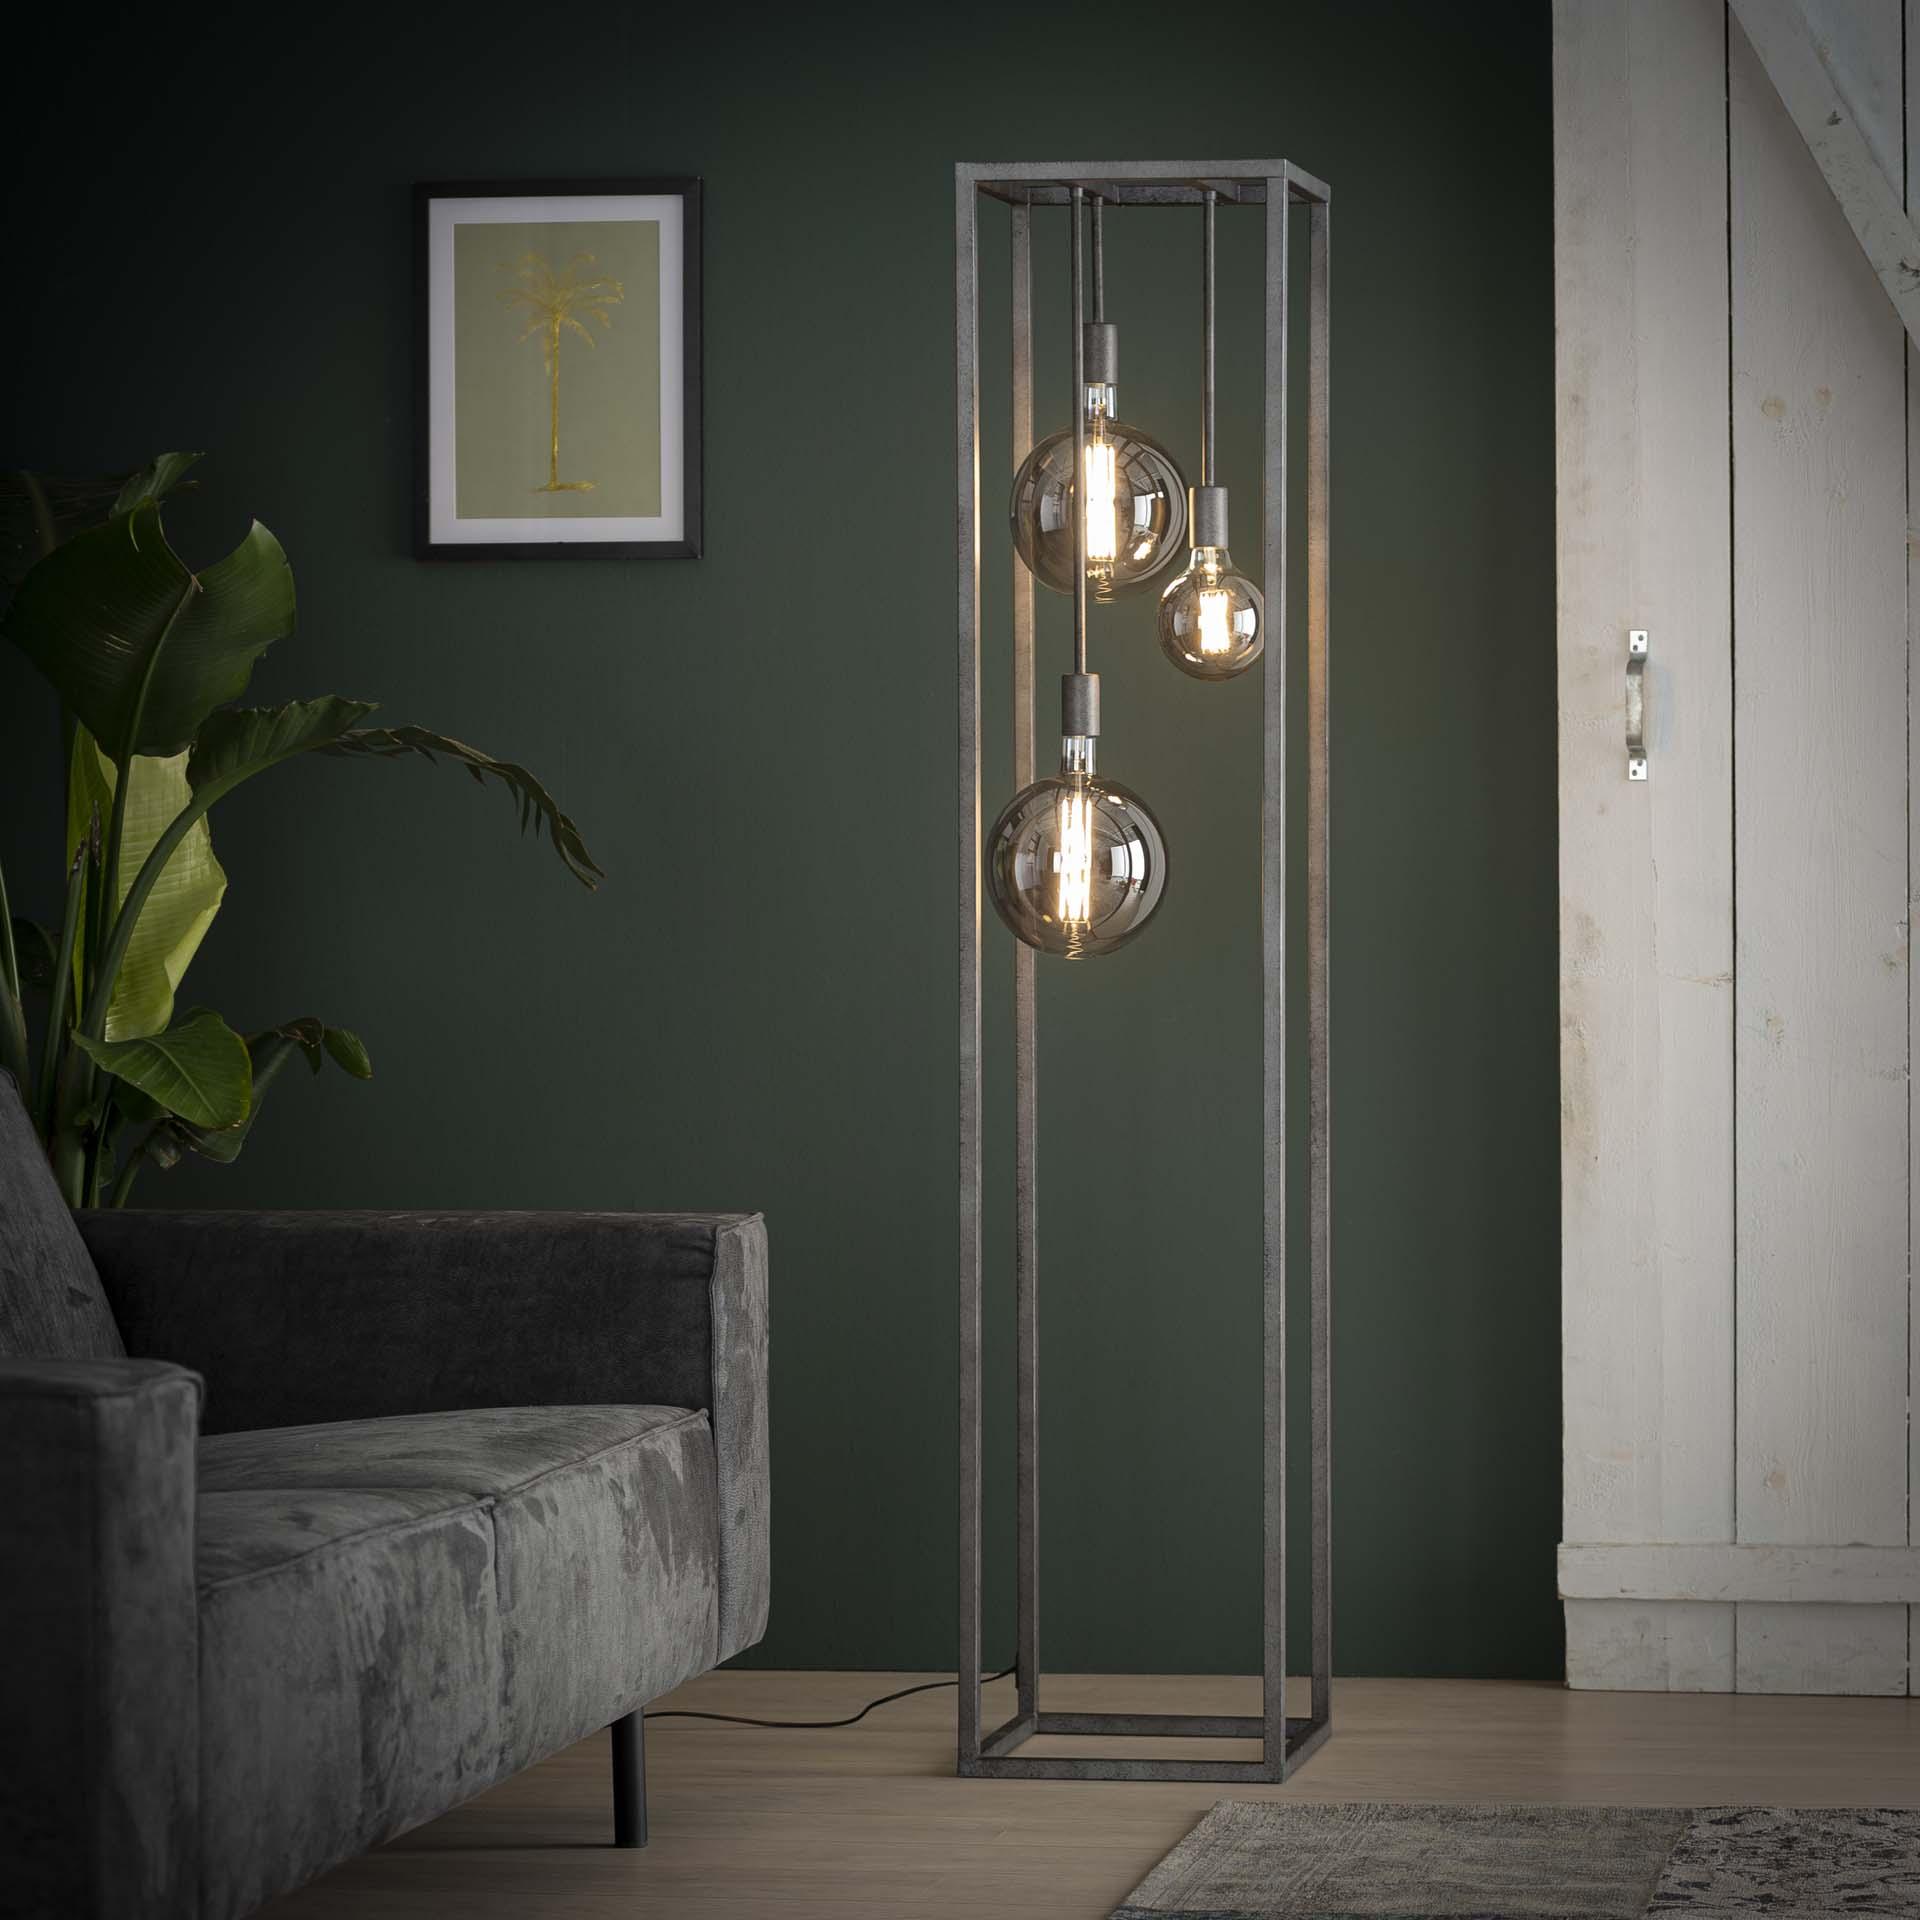 Vloerlamp pilar XL frame vierkante buis Oud zilver